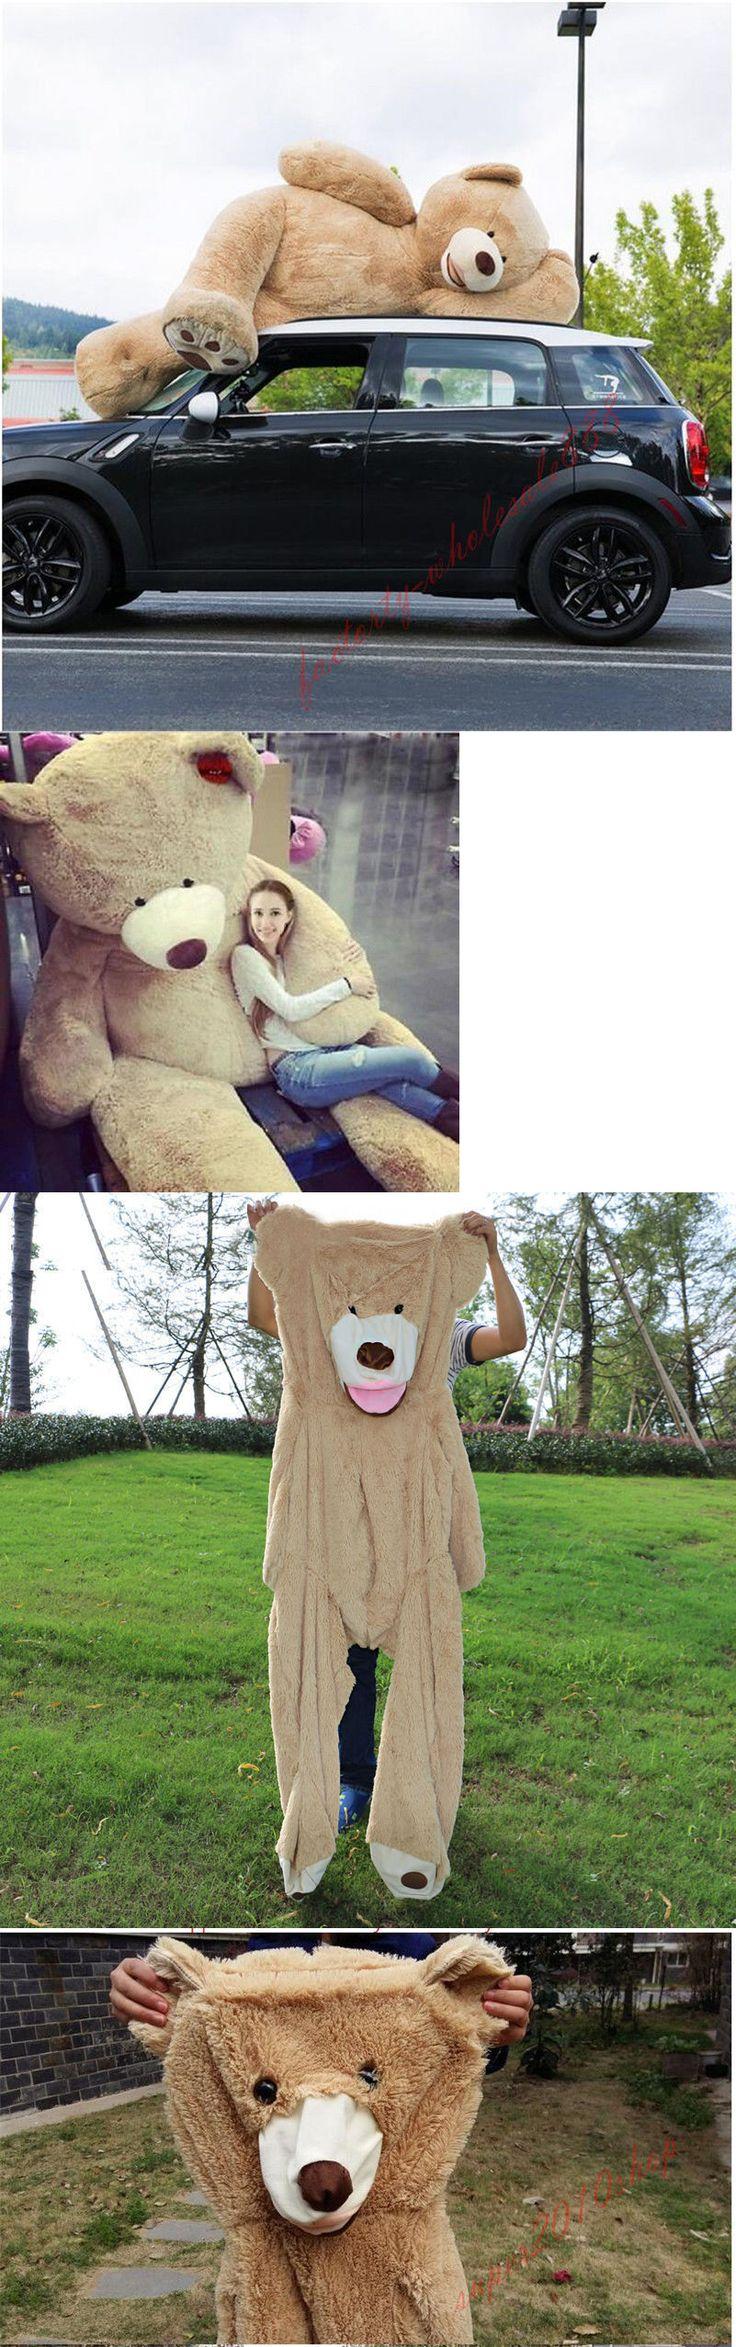 Toys for Baby 19068: 80Cm-340Cm Giant Bear Skin Toy American Bear Plush Teddy Bear Bearskin Gift -> BUY IT NOW ONLY: $39.5 on eBay!